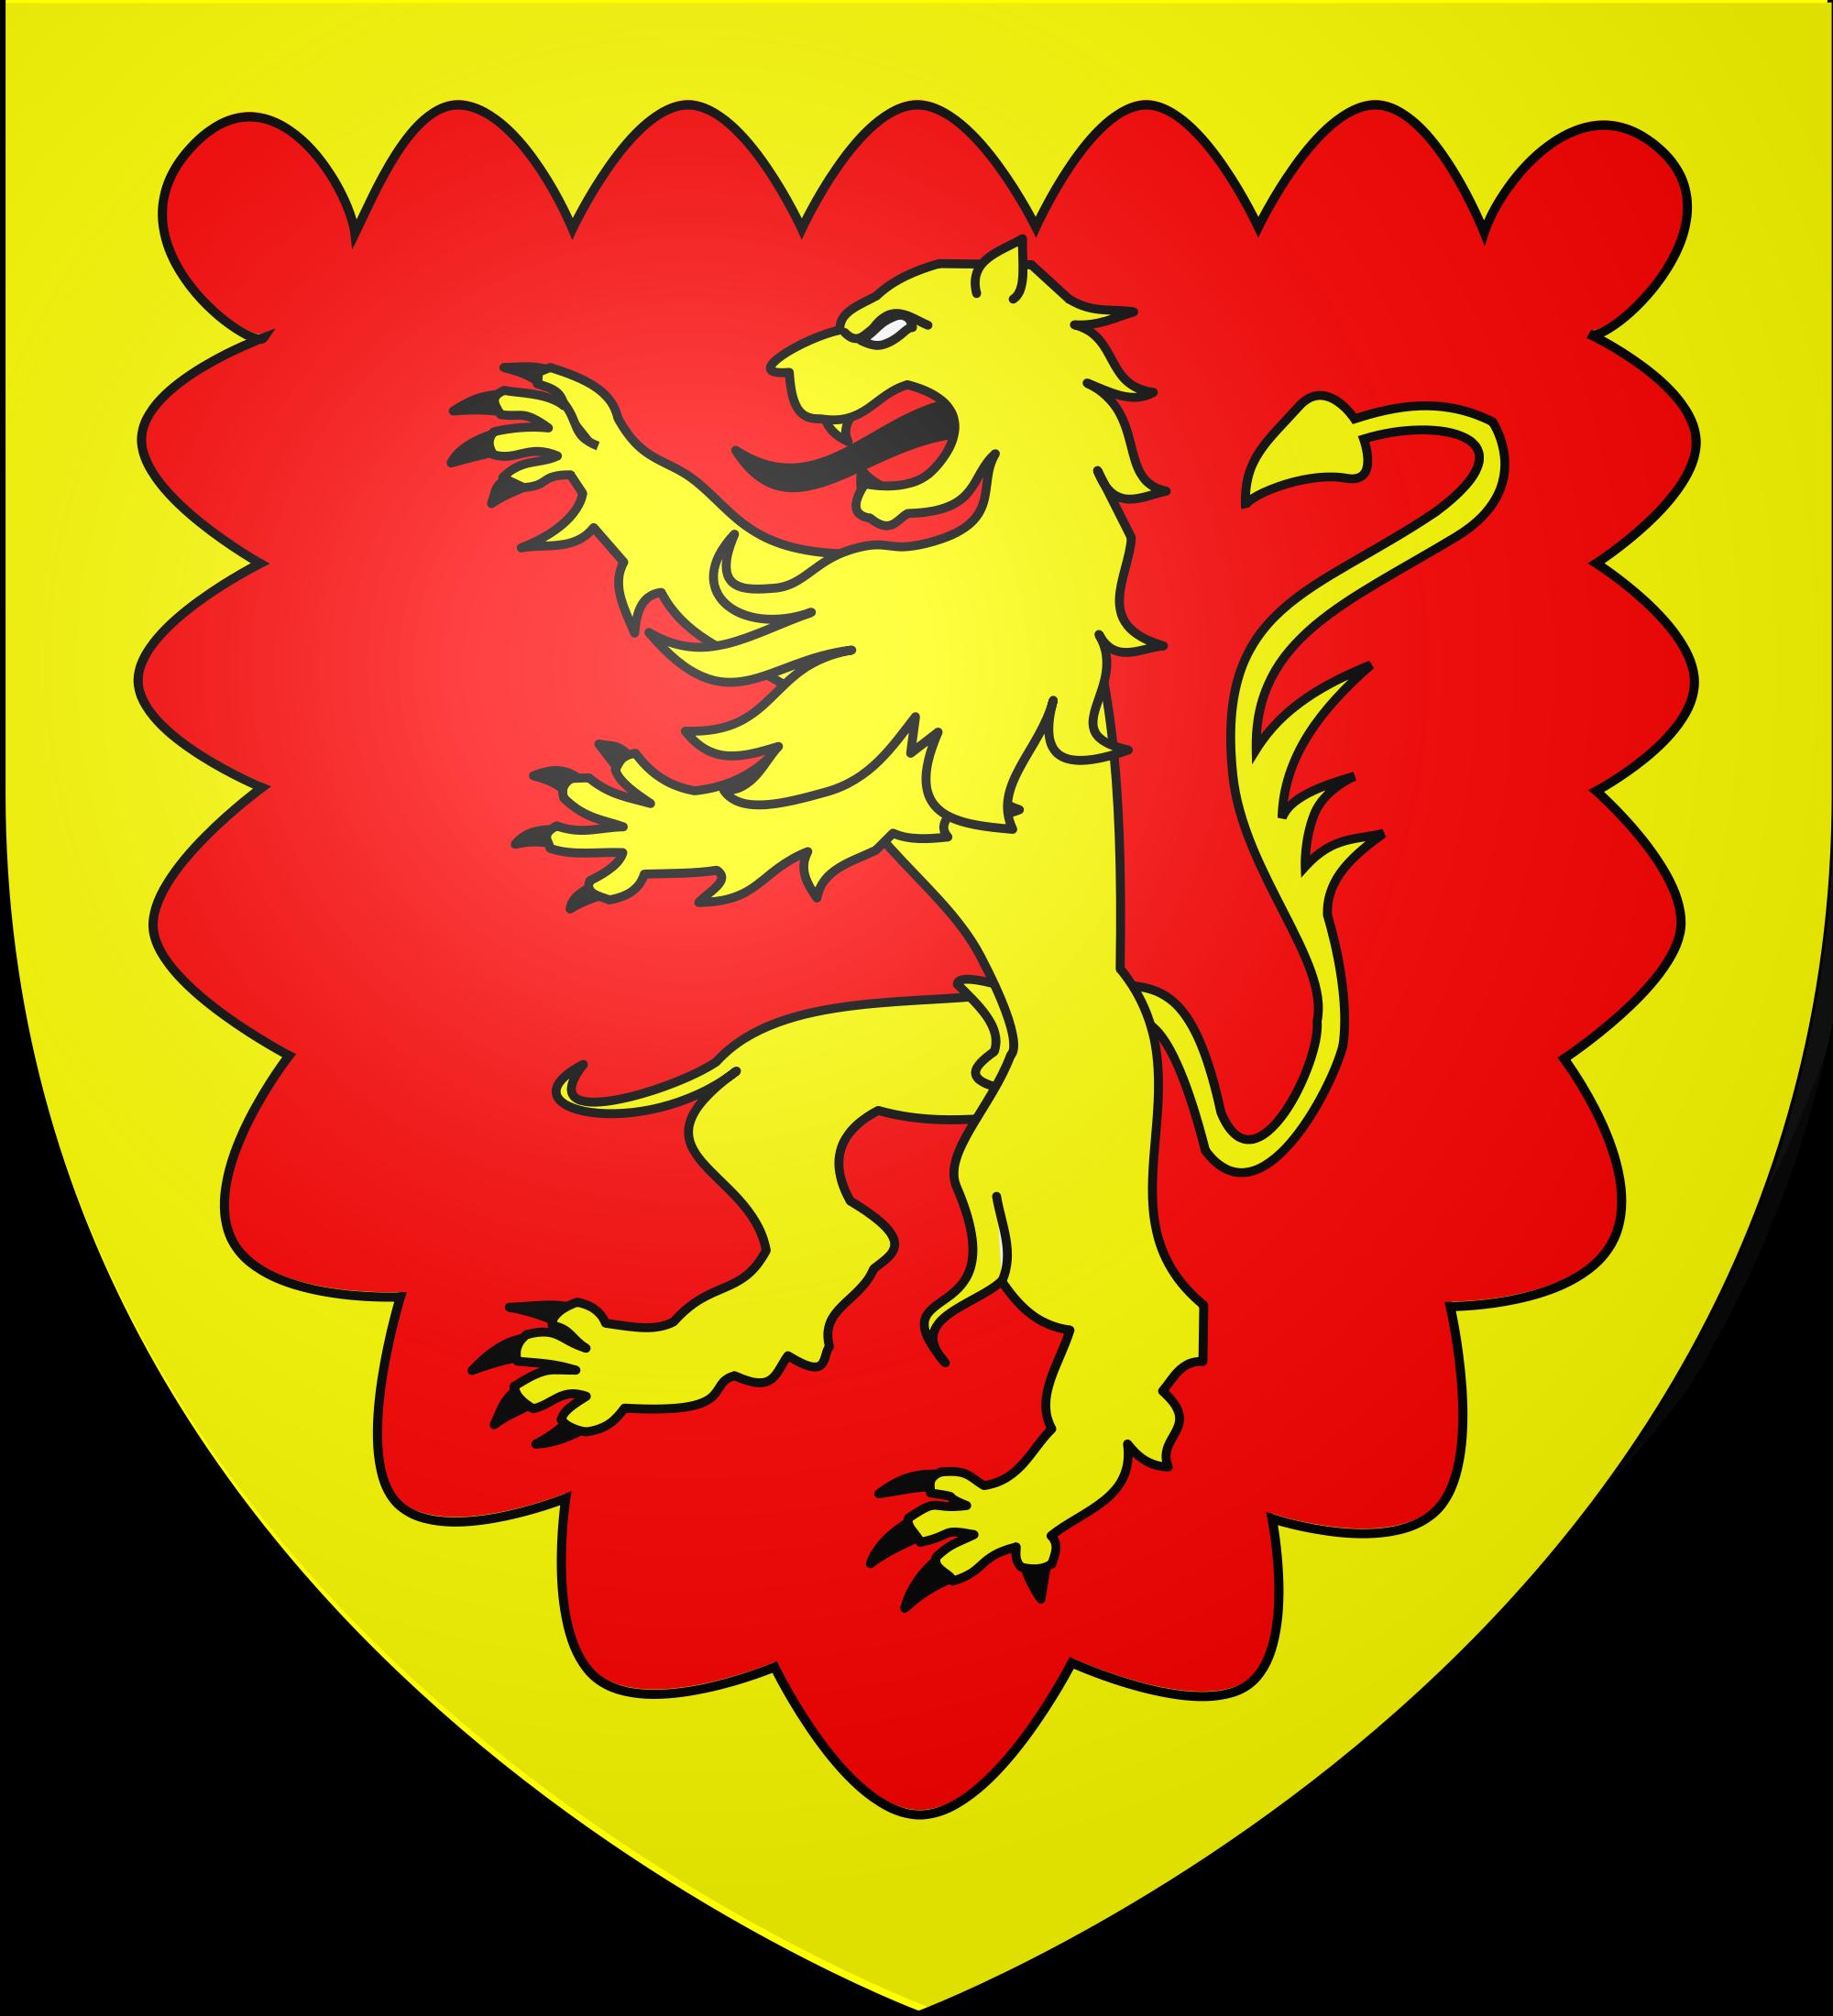 Heraldry for the kingdom of deheubarth heraldry pinterest explore wales and more buycottarizona